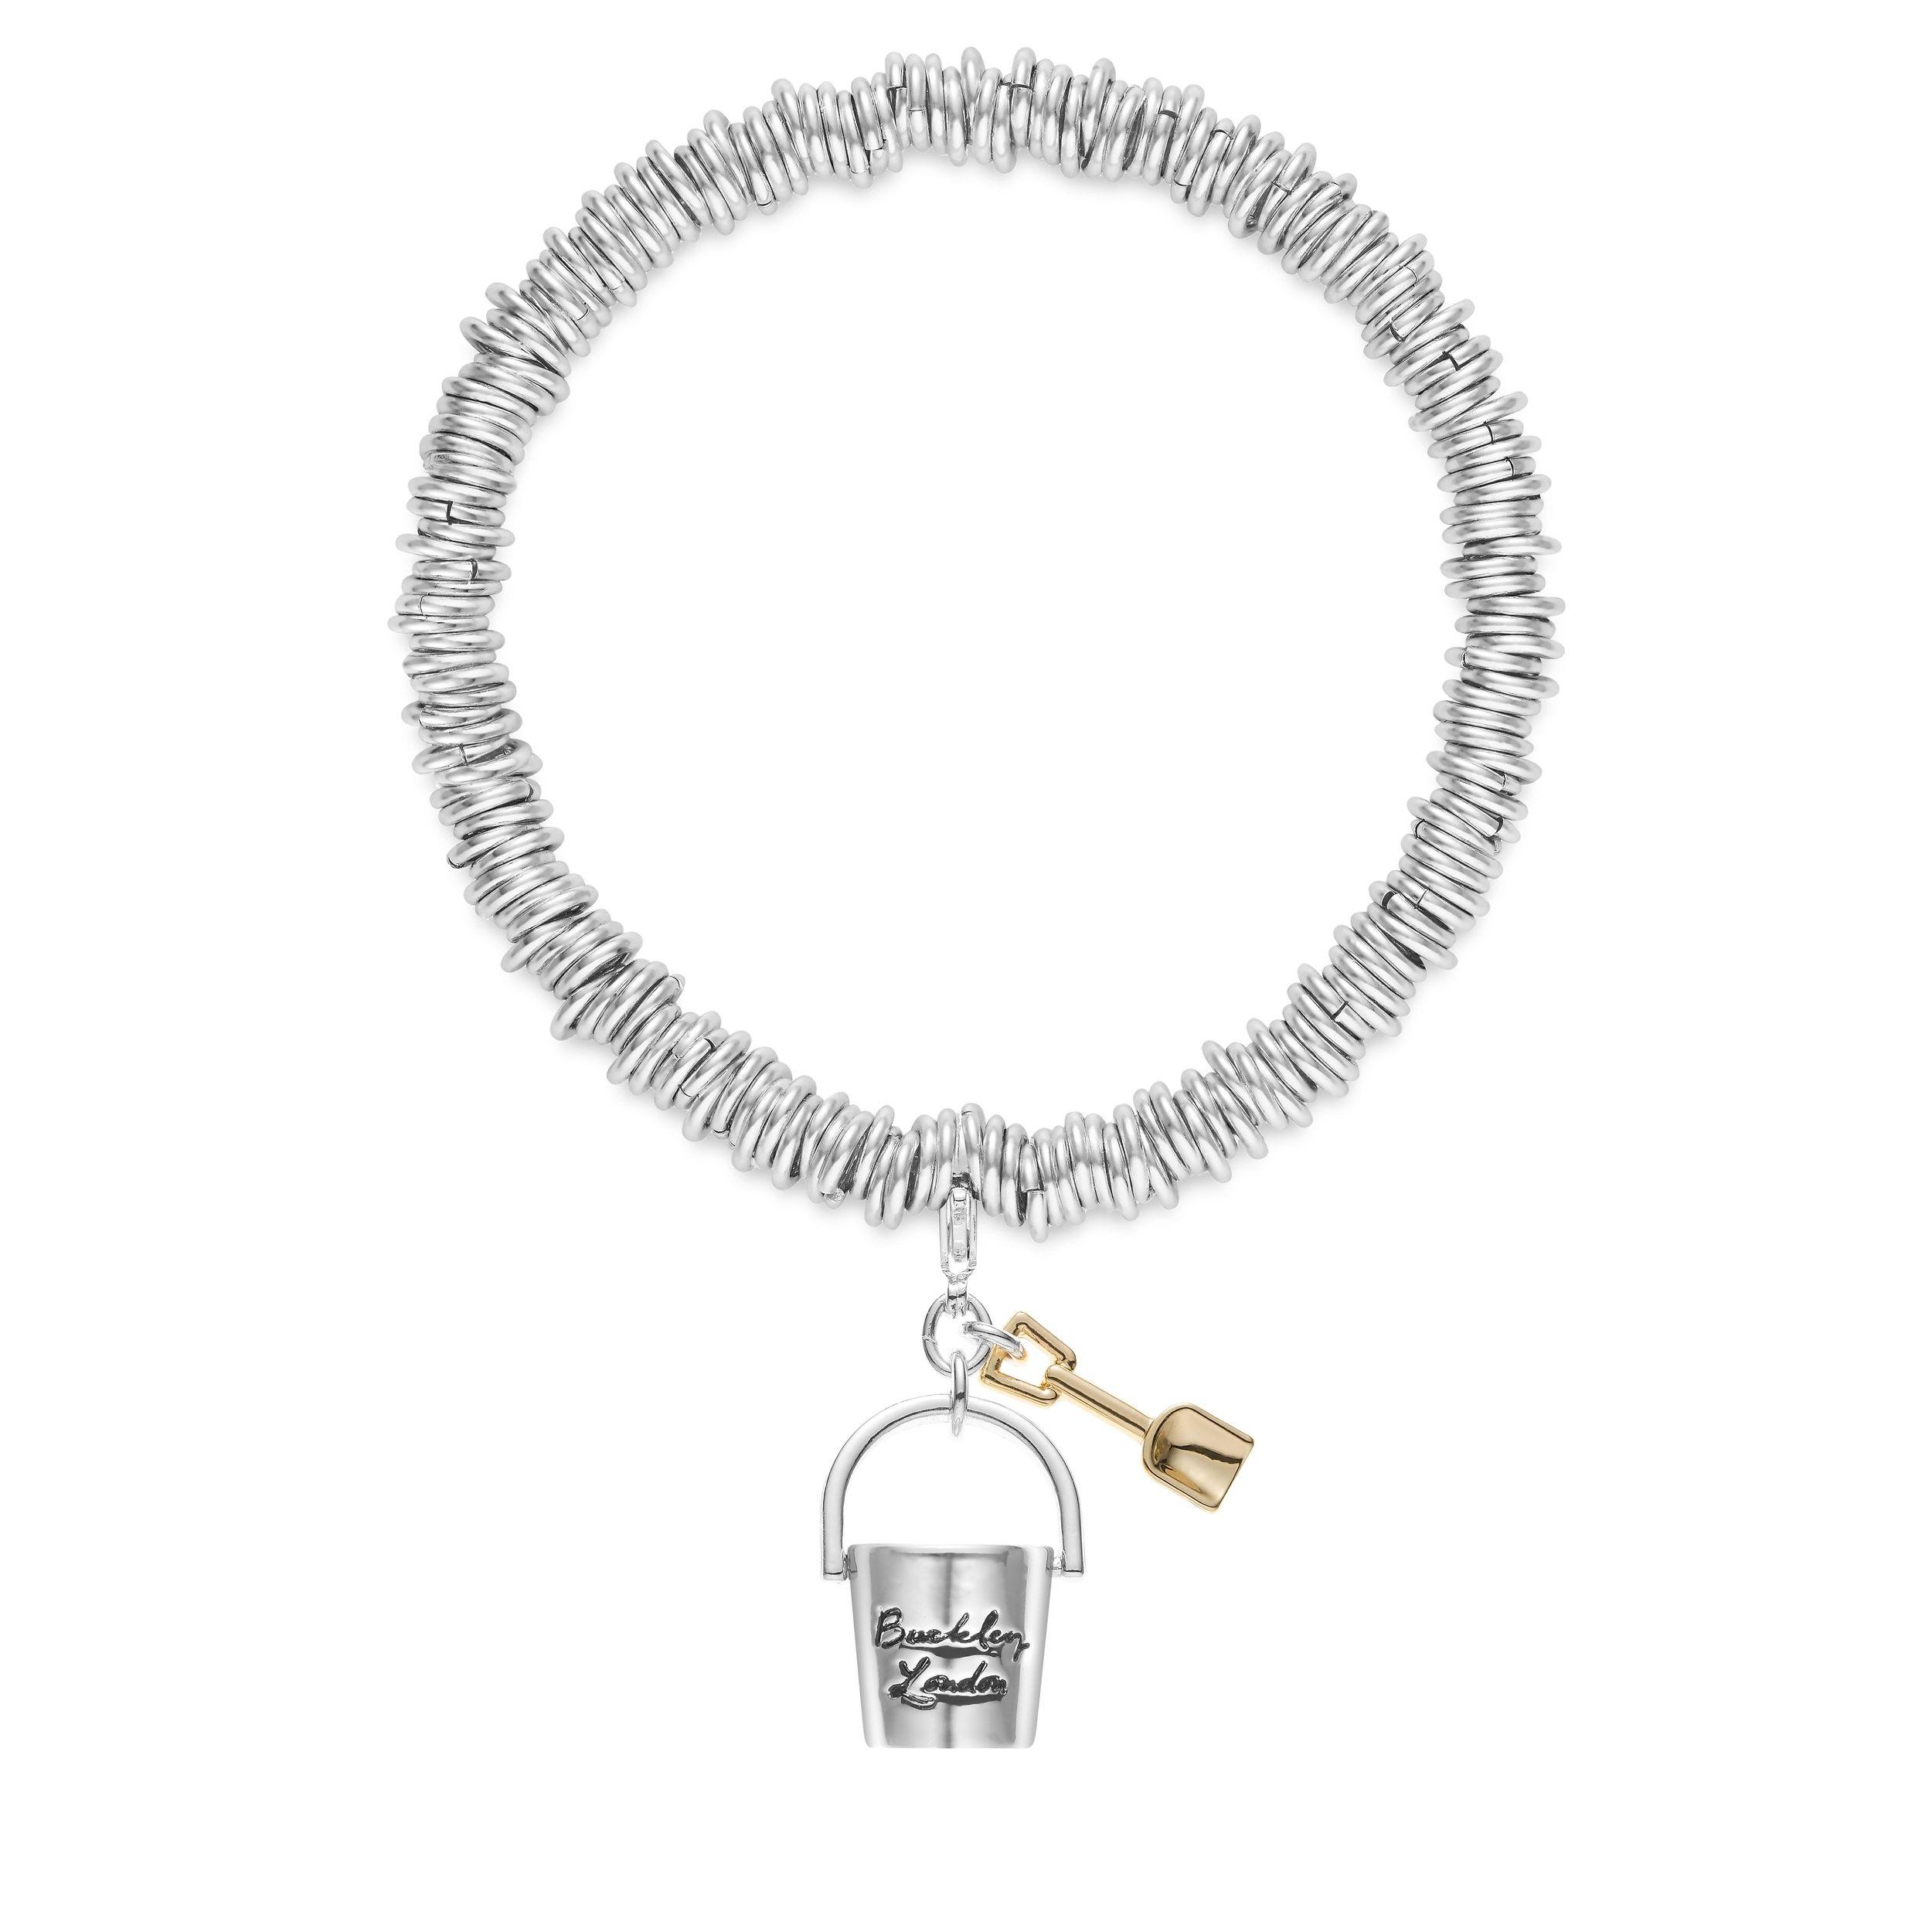 Buckley London Britsh Bucket & Spade Charm Bracelet